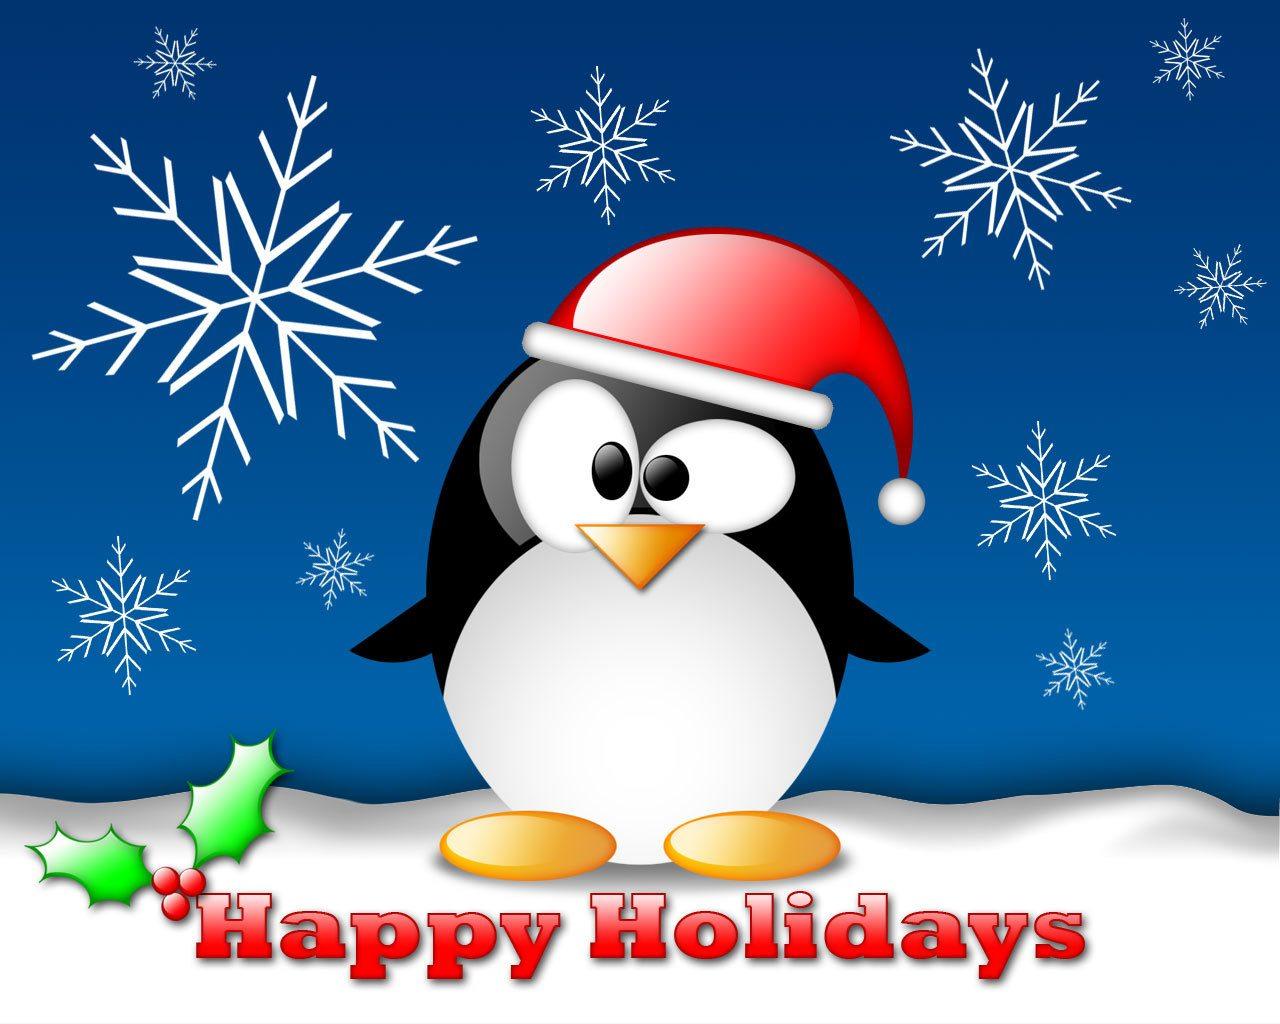 Winter-Season-With-Happy-Holiday-